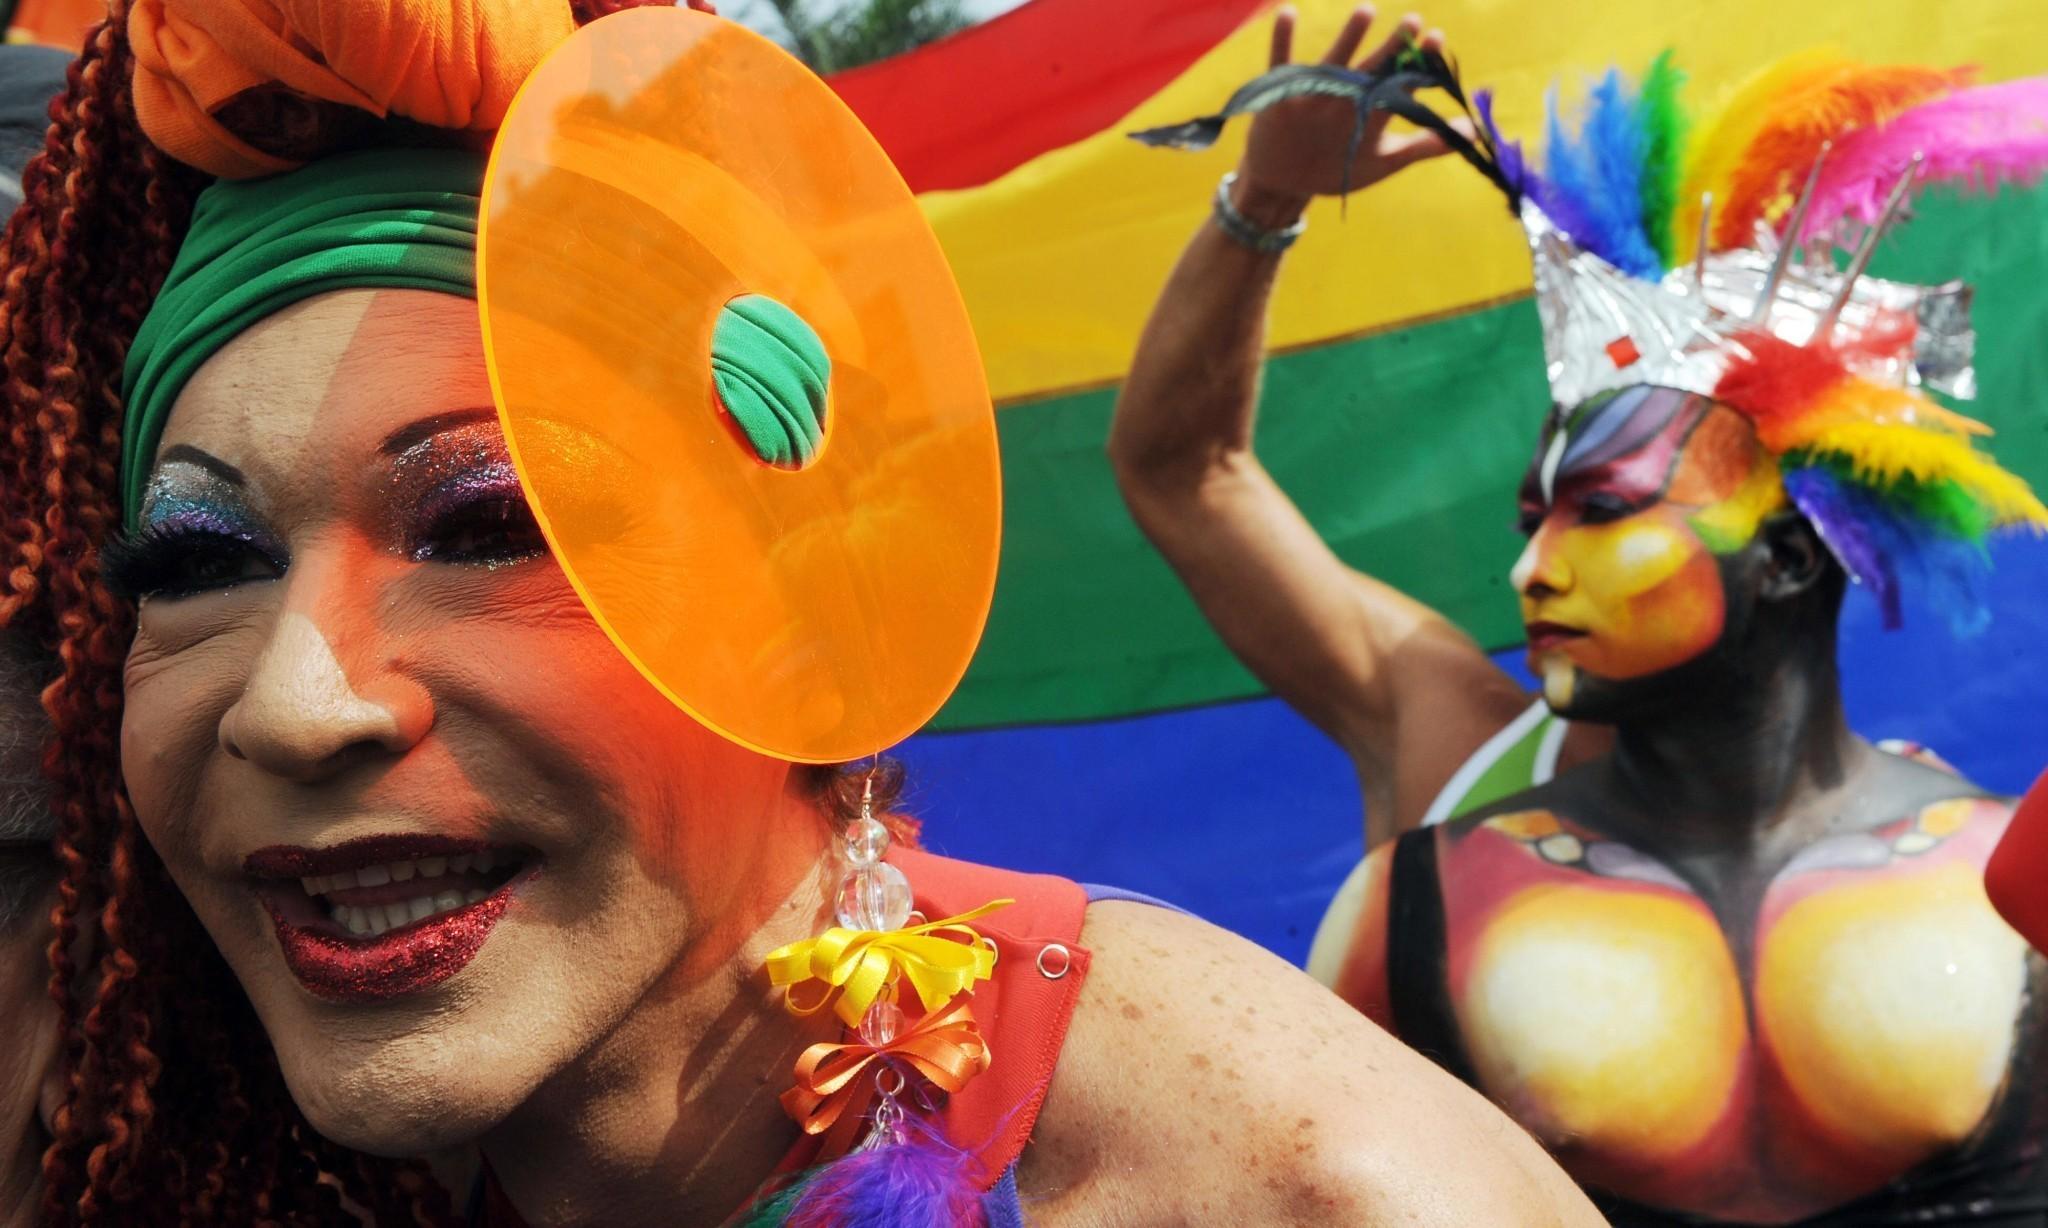 Six countries making progress on LGBT rights